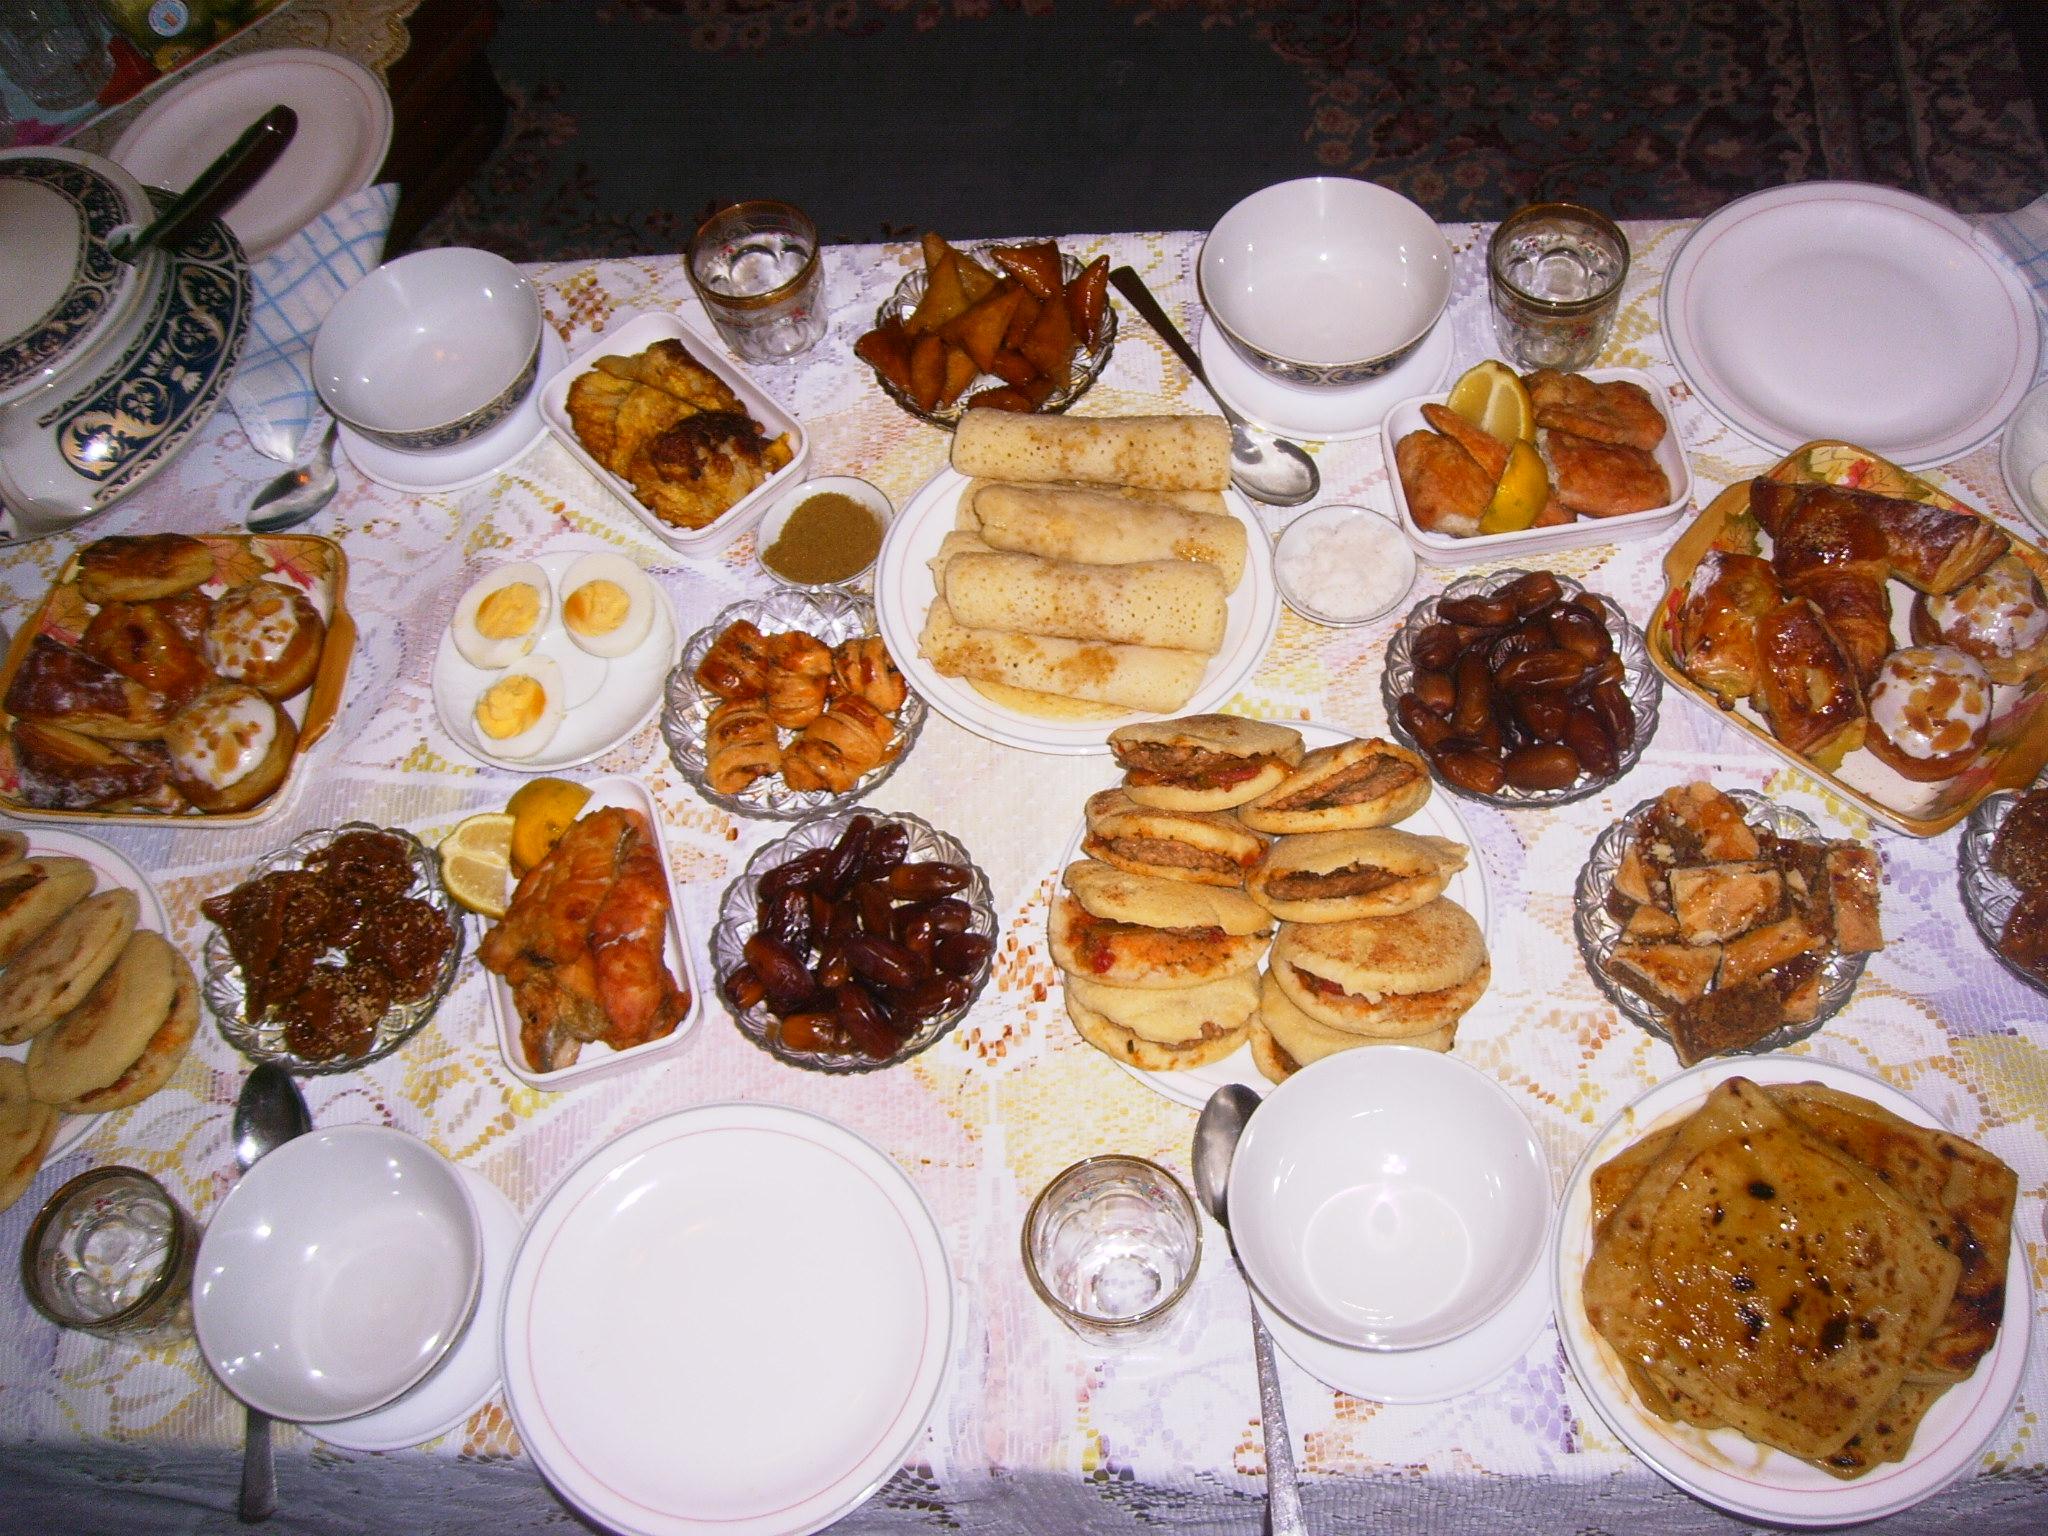 La cuisine orientale delphinetika blog r gime - Cuisine orientale blog ...